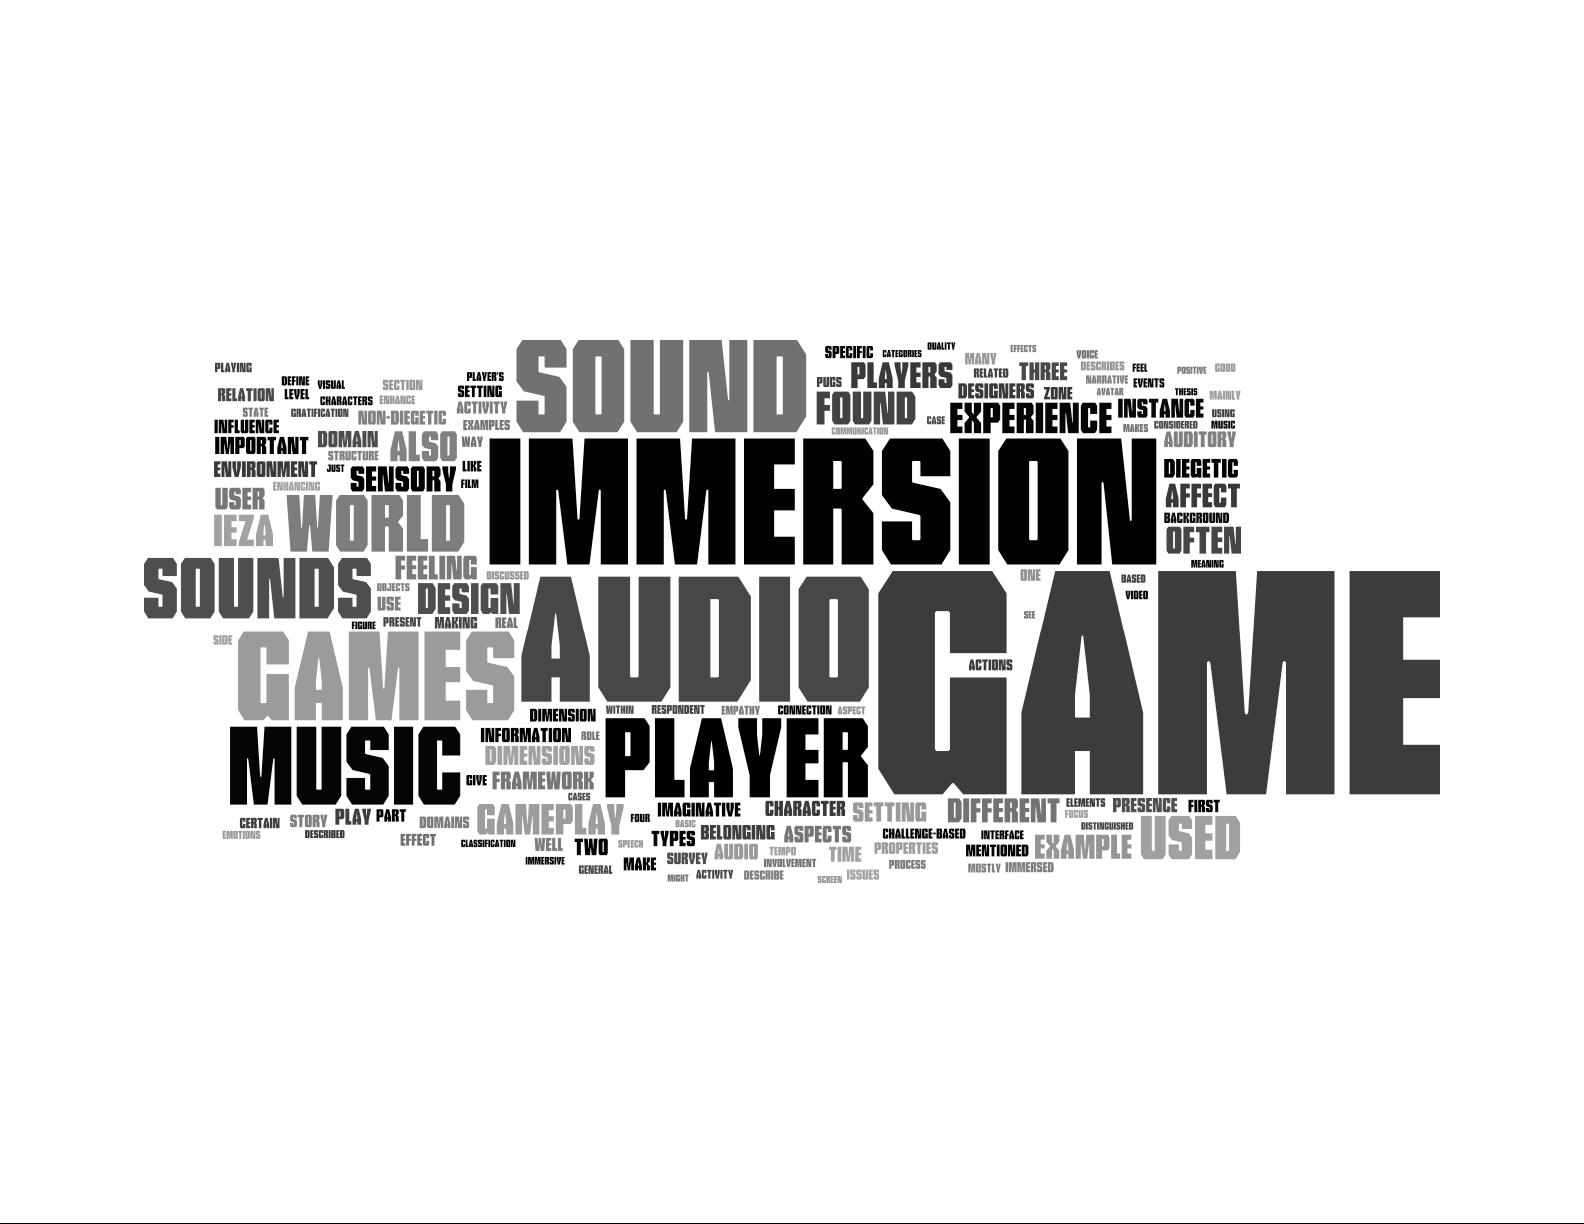 Mini Monster Media: Video Game Music: Player Immersion